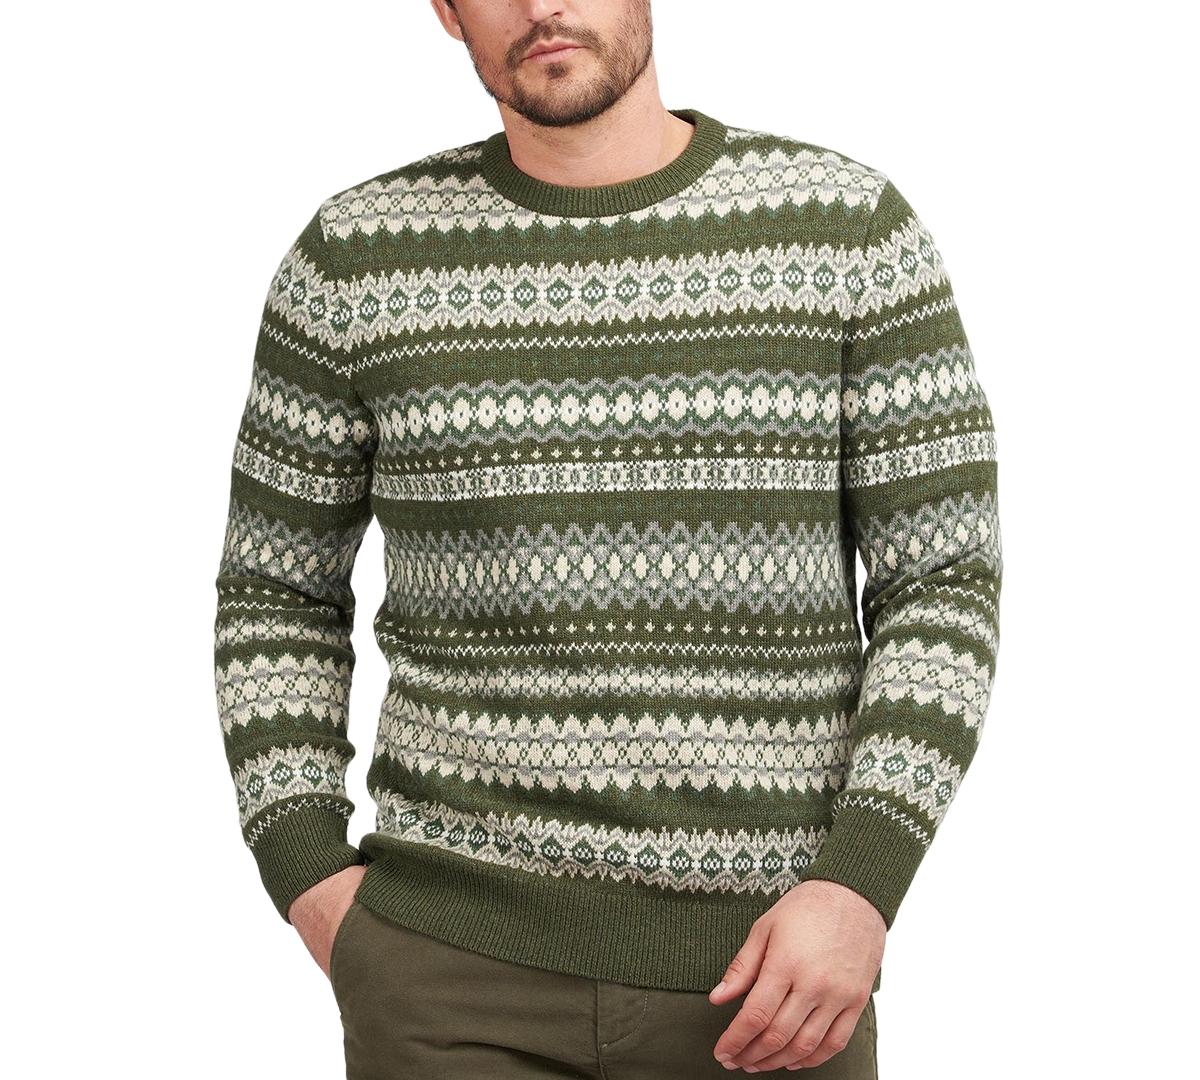 1920s Men's Sweaters, Cardigans, Knitwear Barbour Mens Fair Isle Sweater $125.00 AT vintagedancer.com